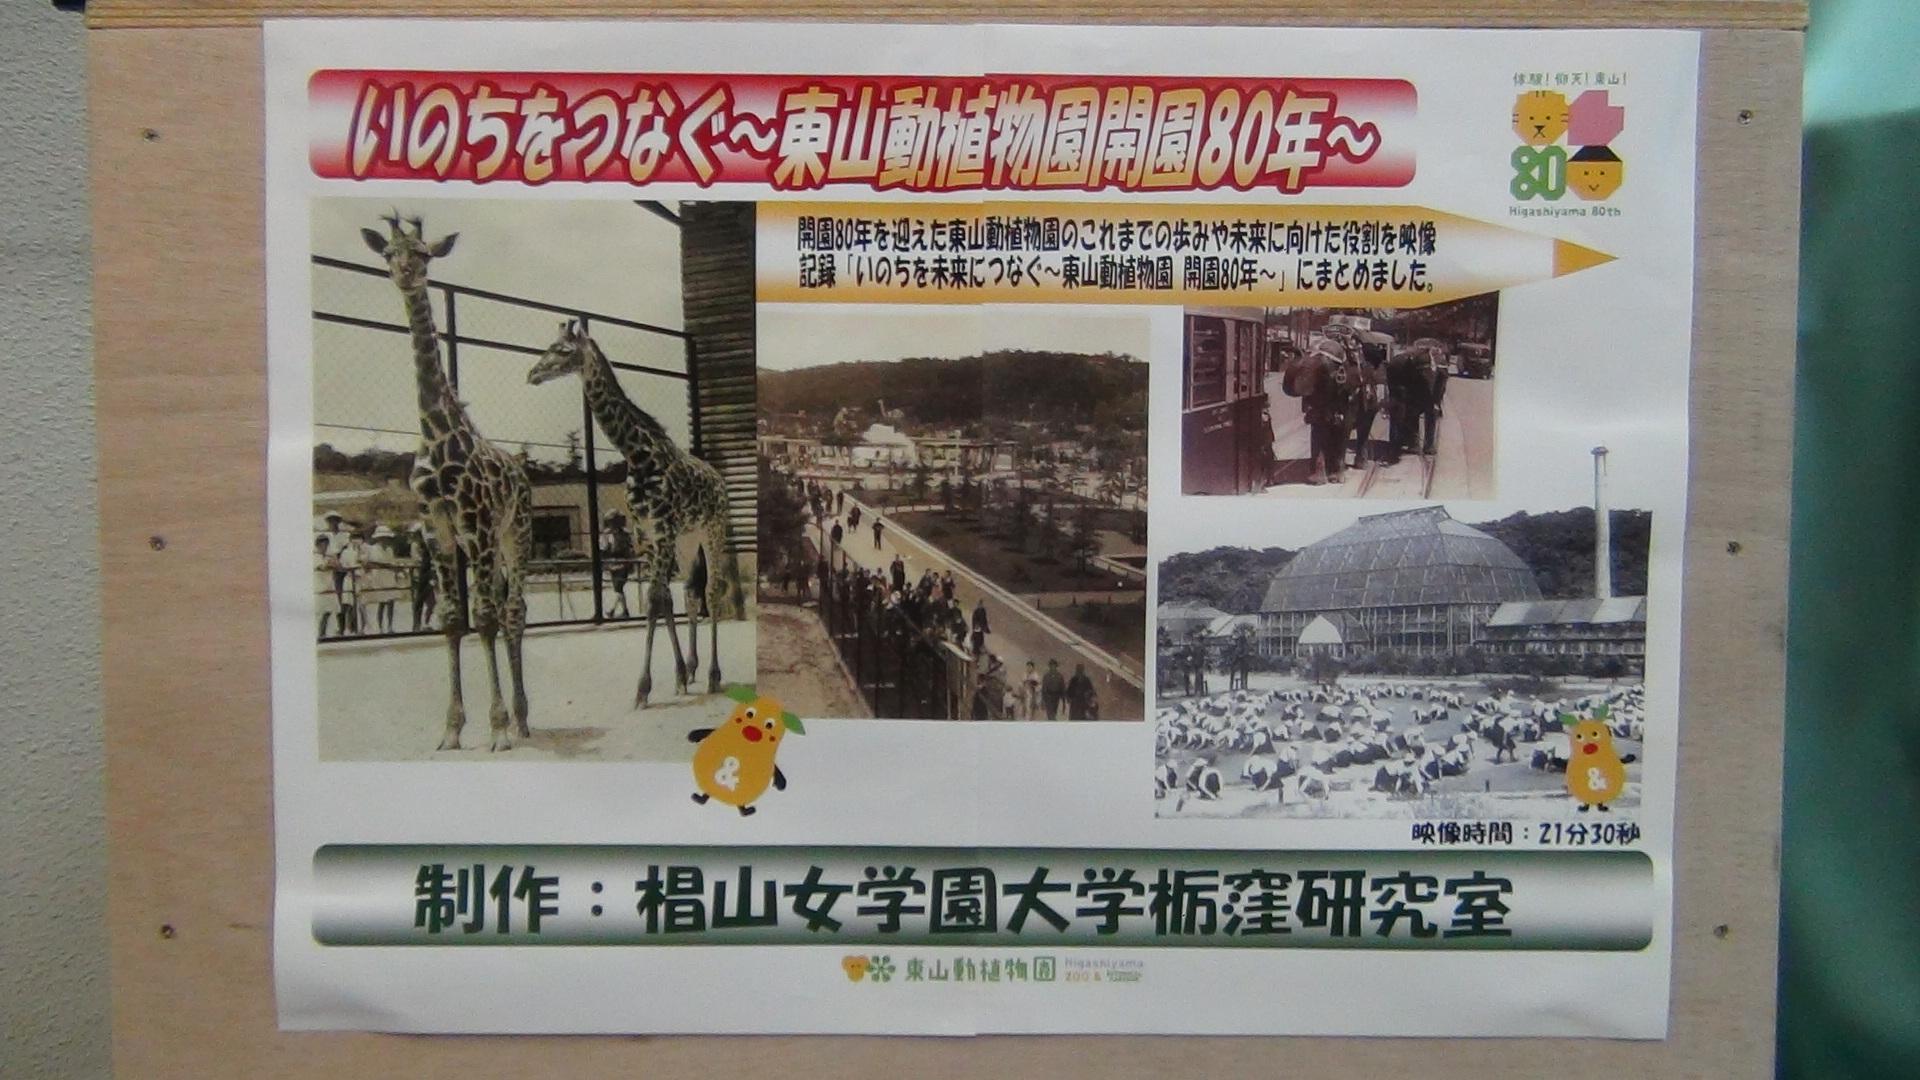 http://tochikubo.ci.sugiyama-u.ac.jp/news/assets/images/DSC00768.JPG